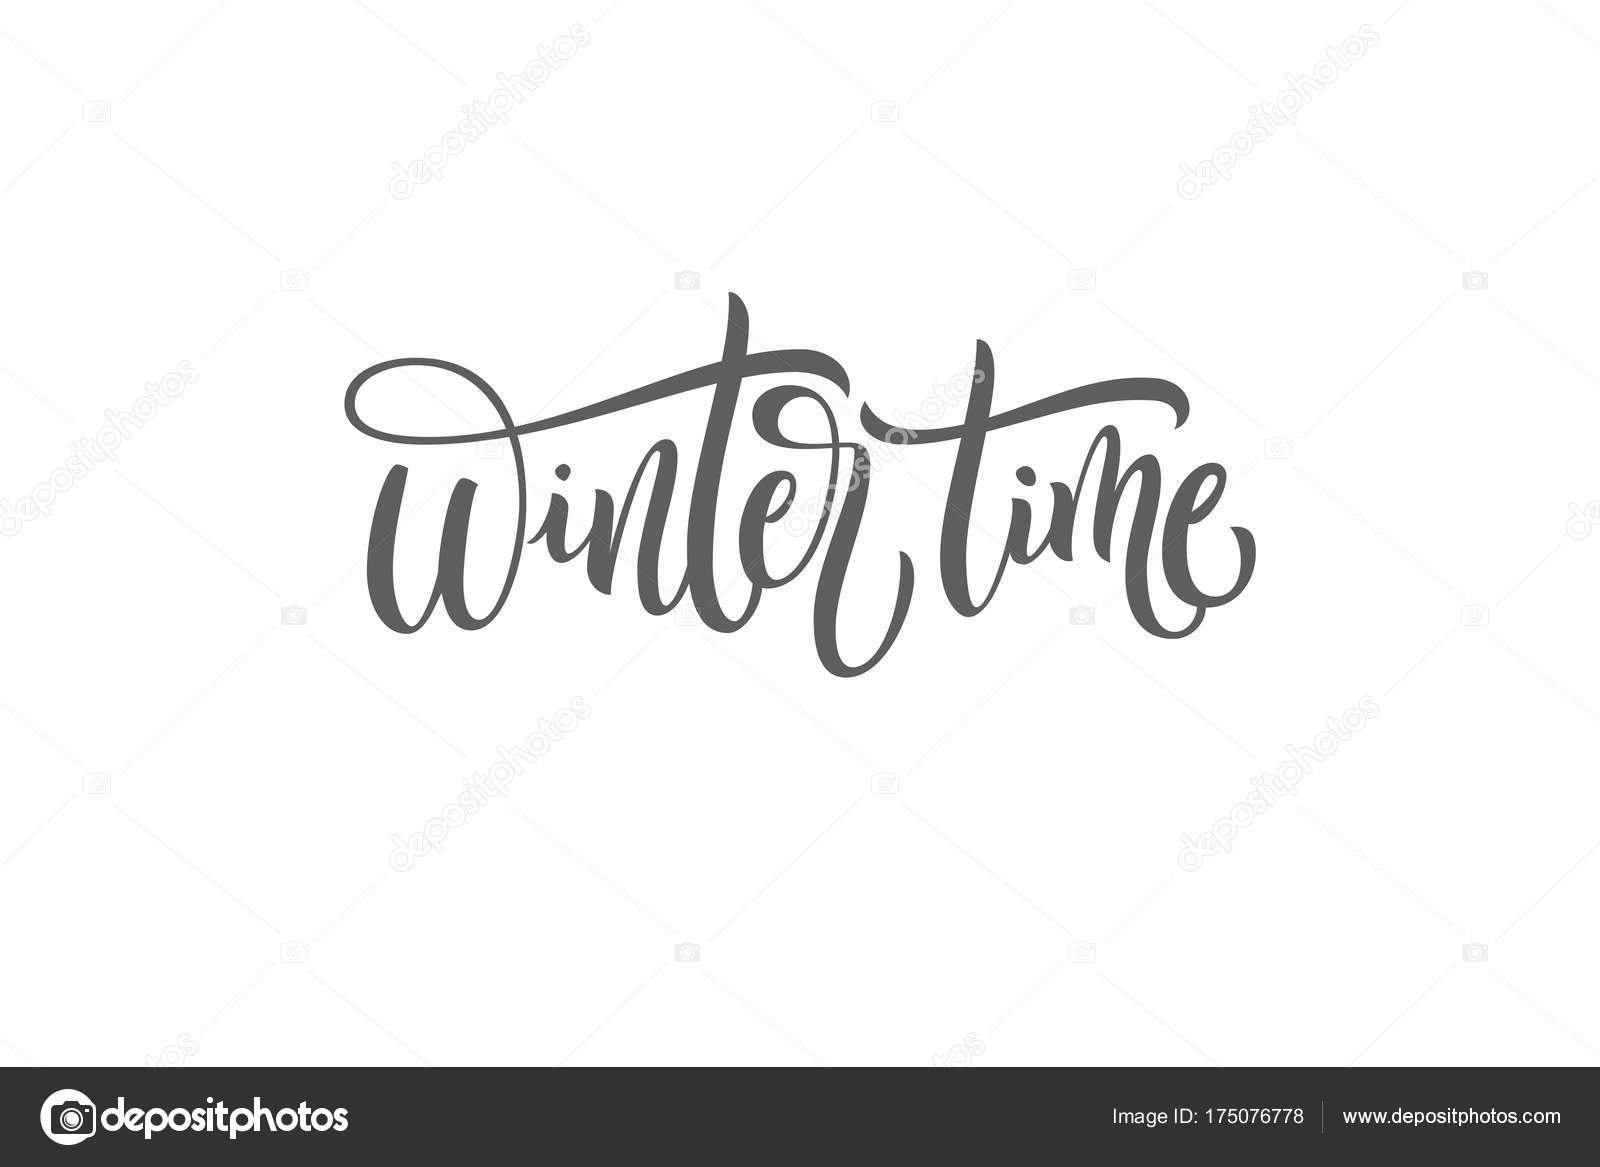 Winter time black and white handwritten lettering inscription